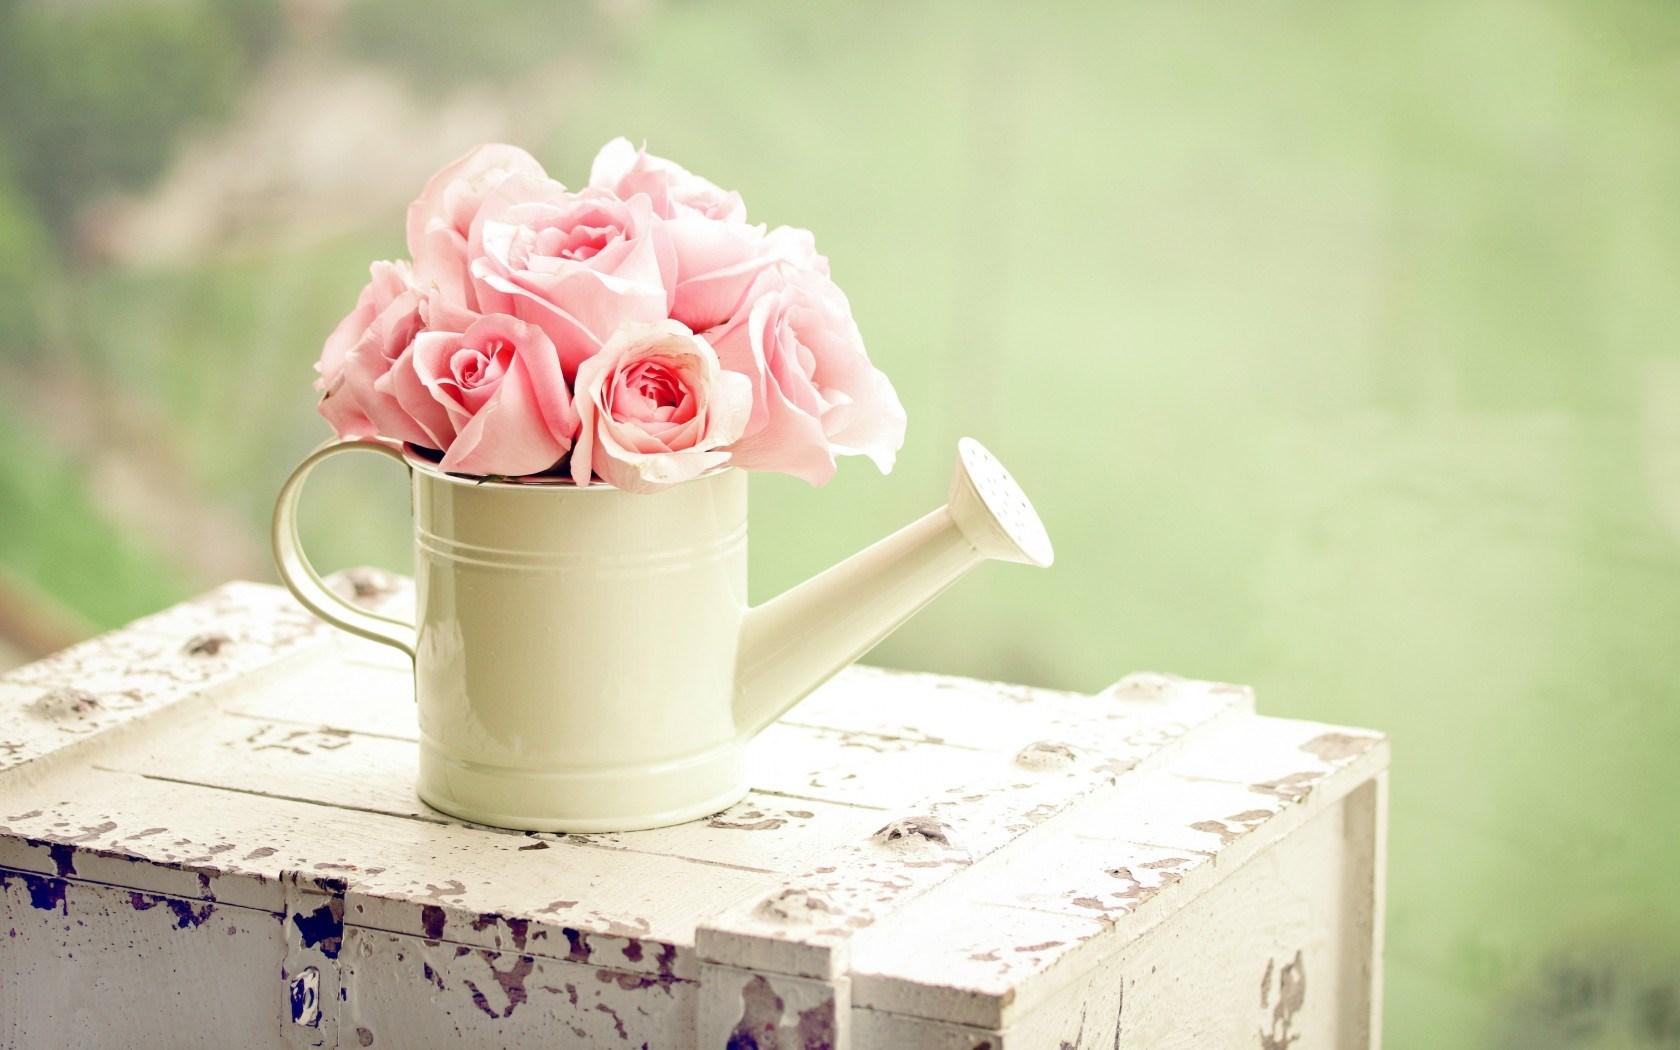 cute pink flowers wallpaper 42176